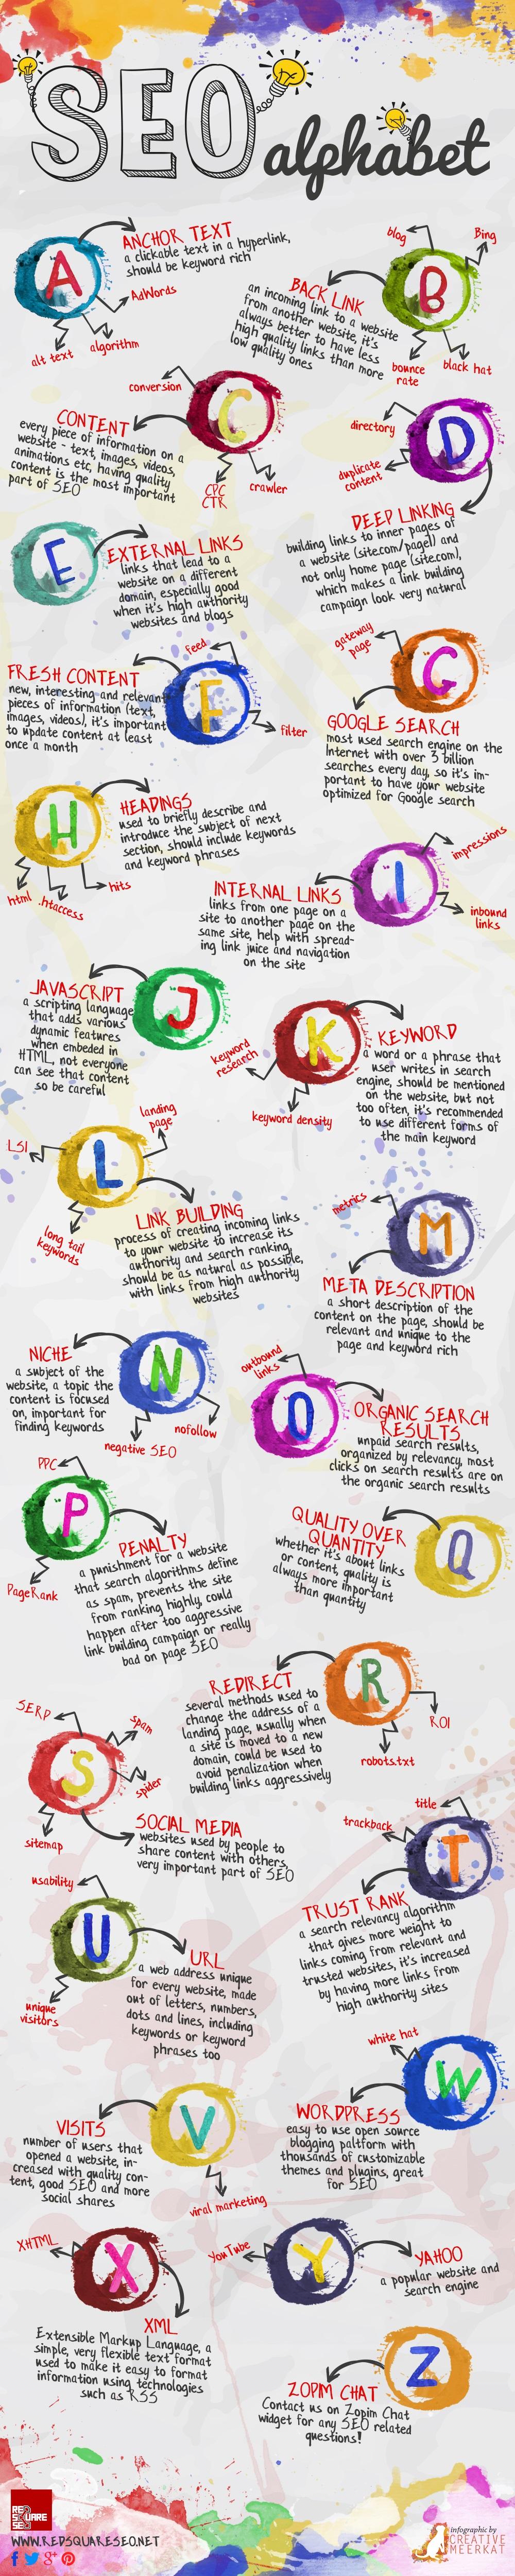 SEO ABCs of Terminologies infographic imageImage